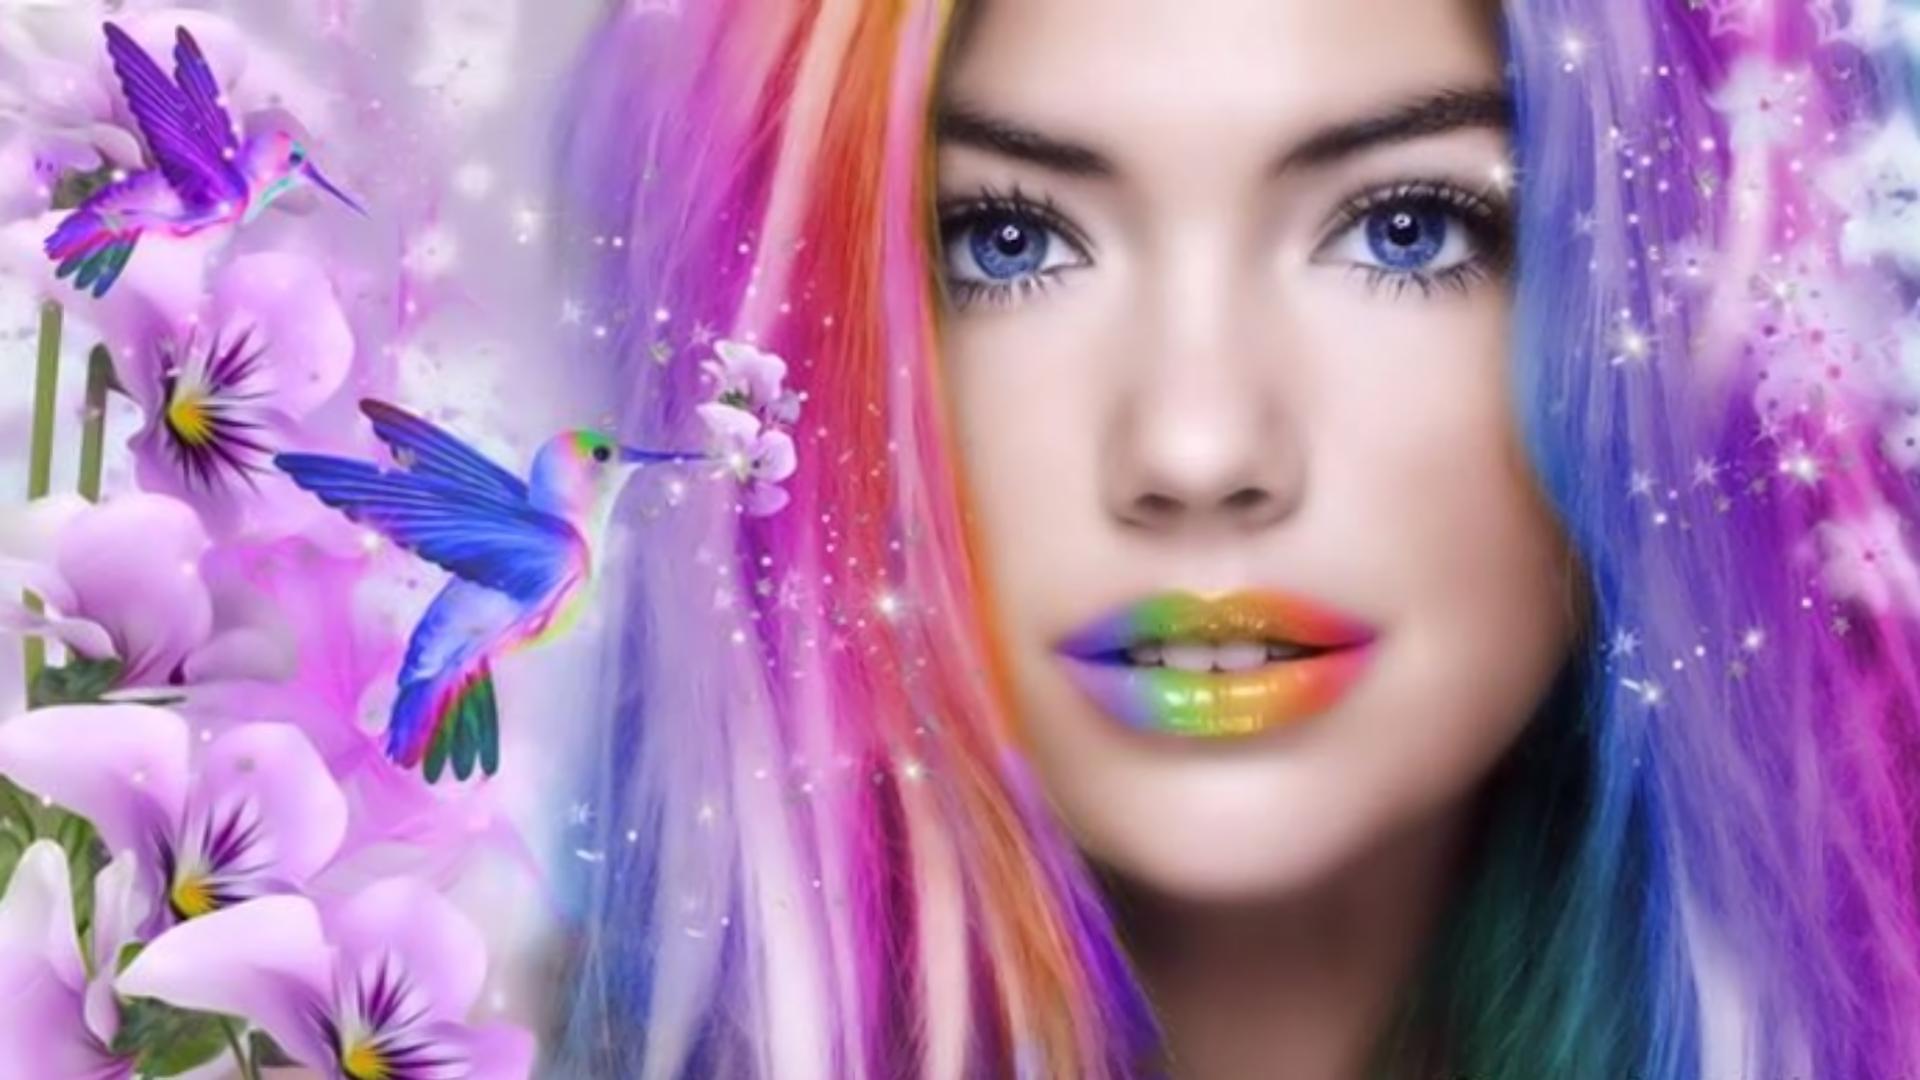 Fantasy - Women  Fantasy Woman Girl Colors Colorful Flower Hummingbird Blue Eyes Lipstick Face Wallpaper